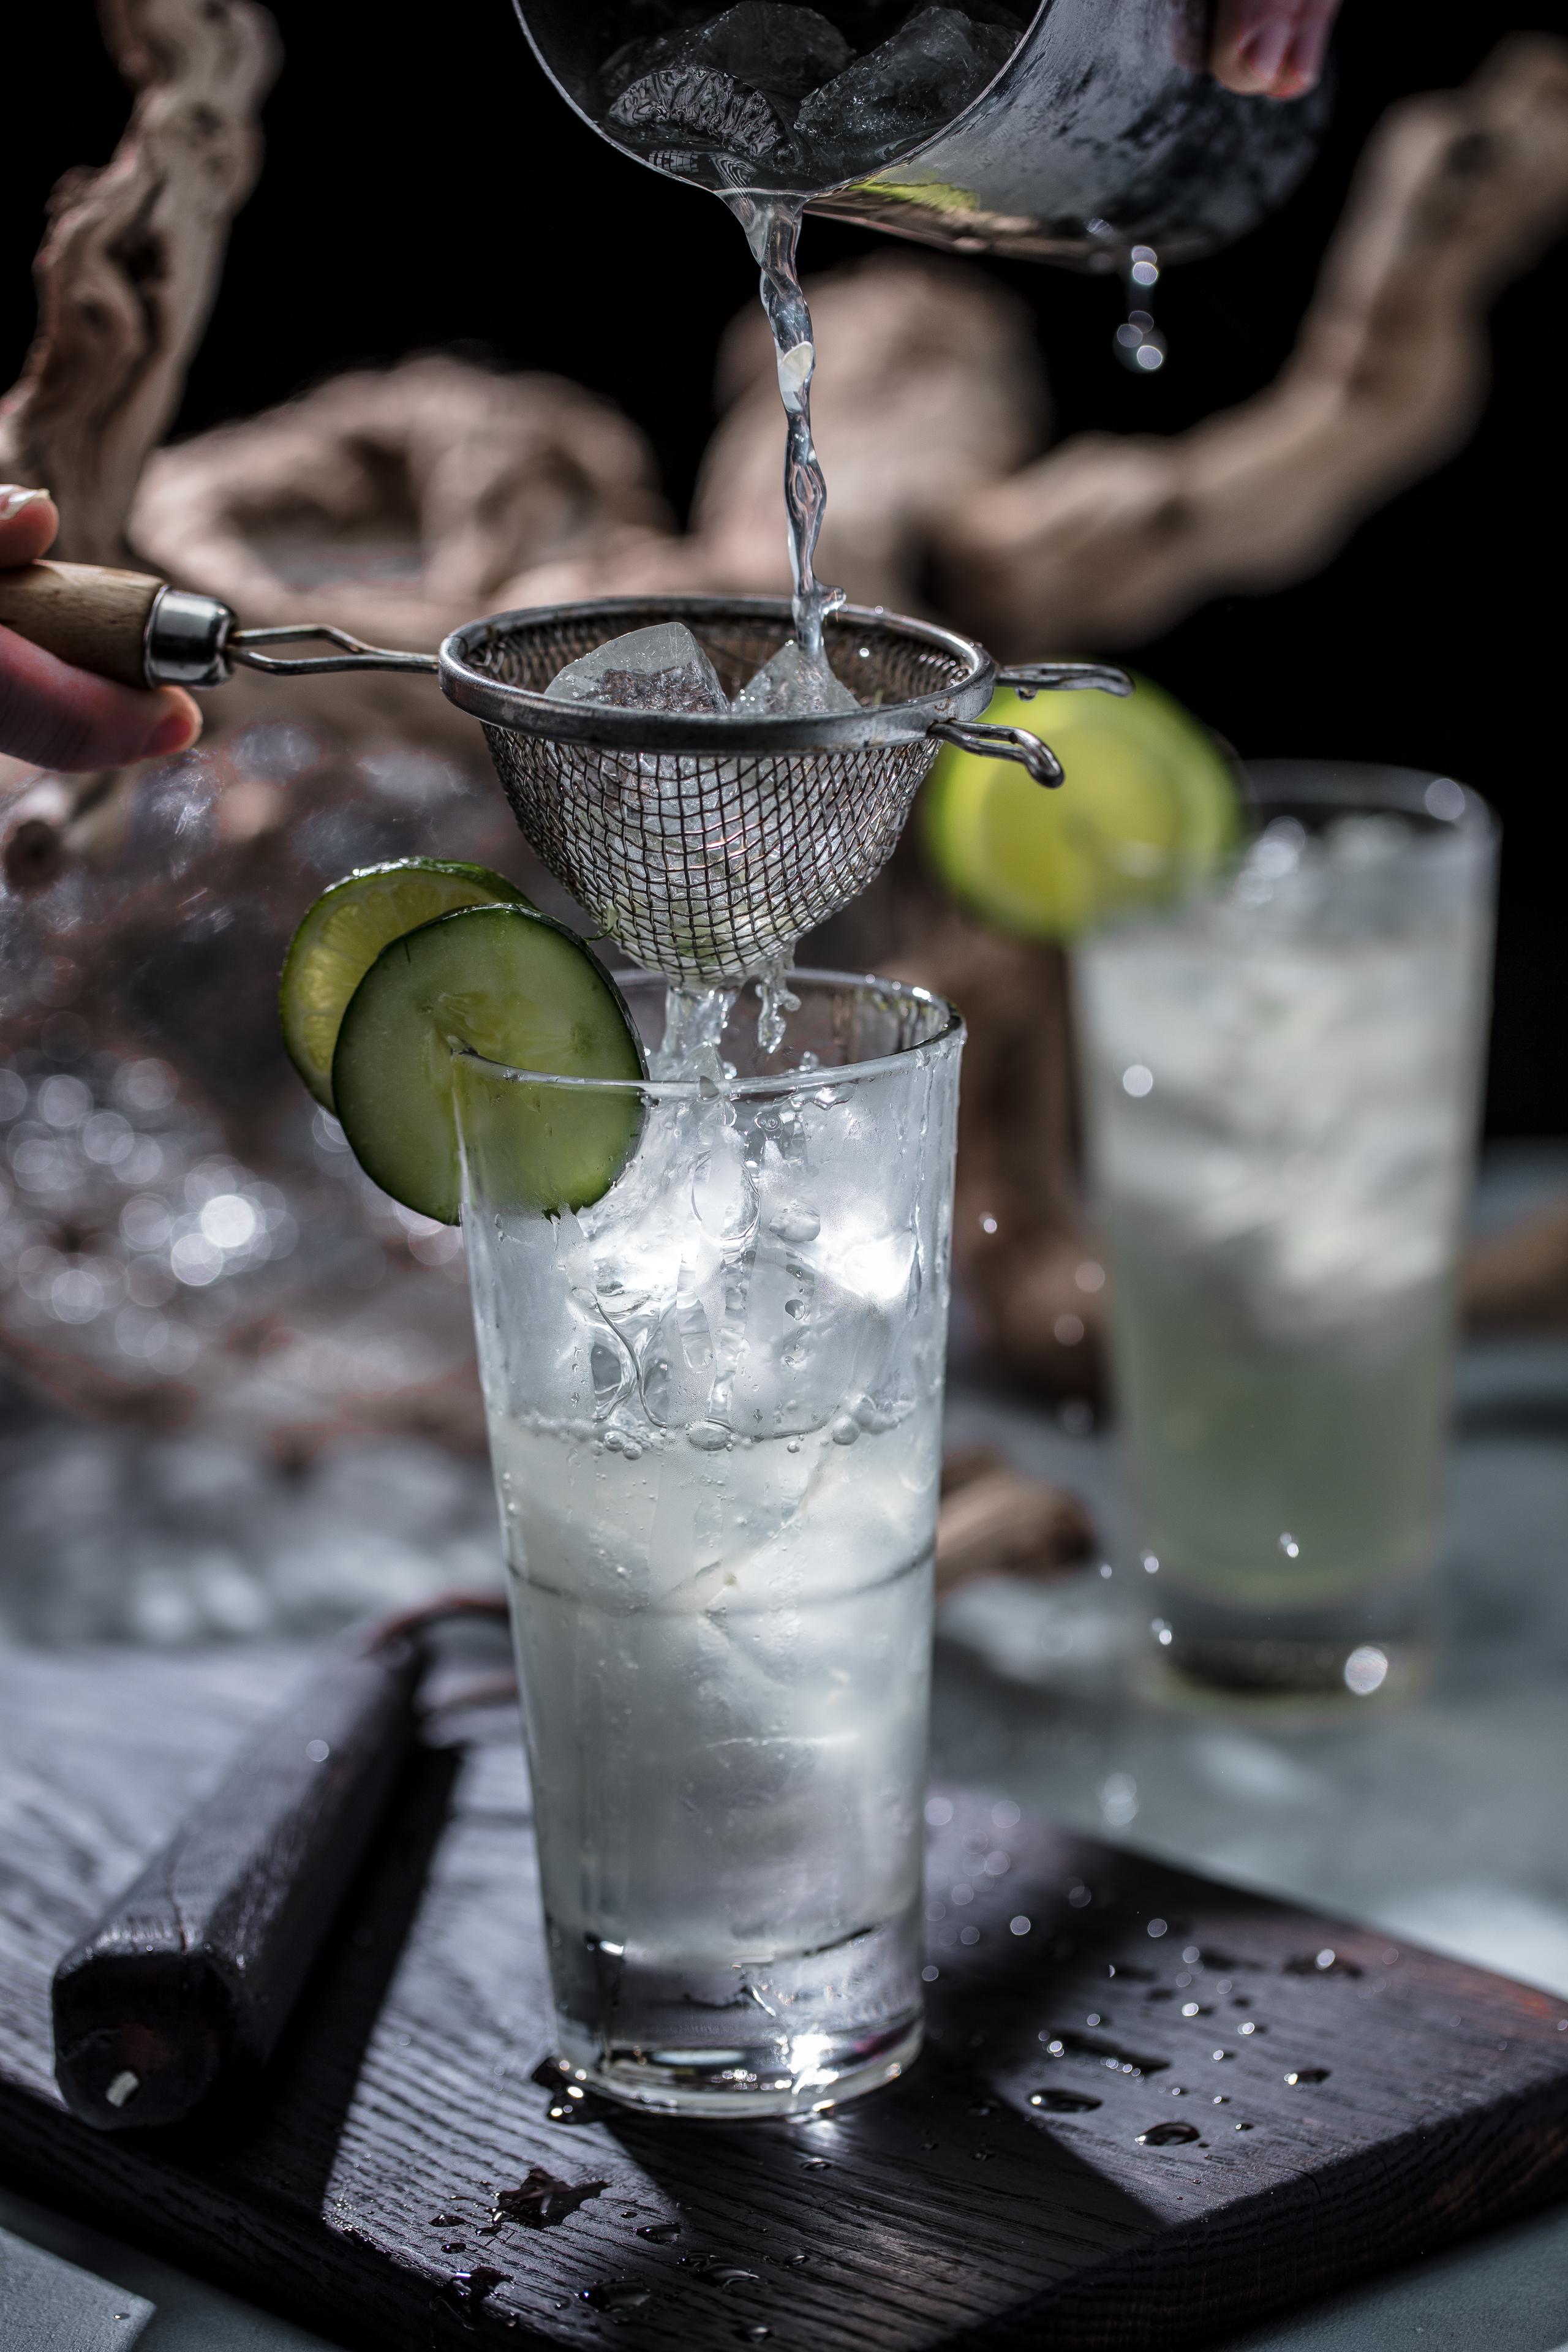 Bos_Drinks_HighRes-11